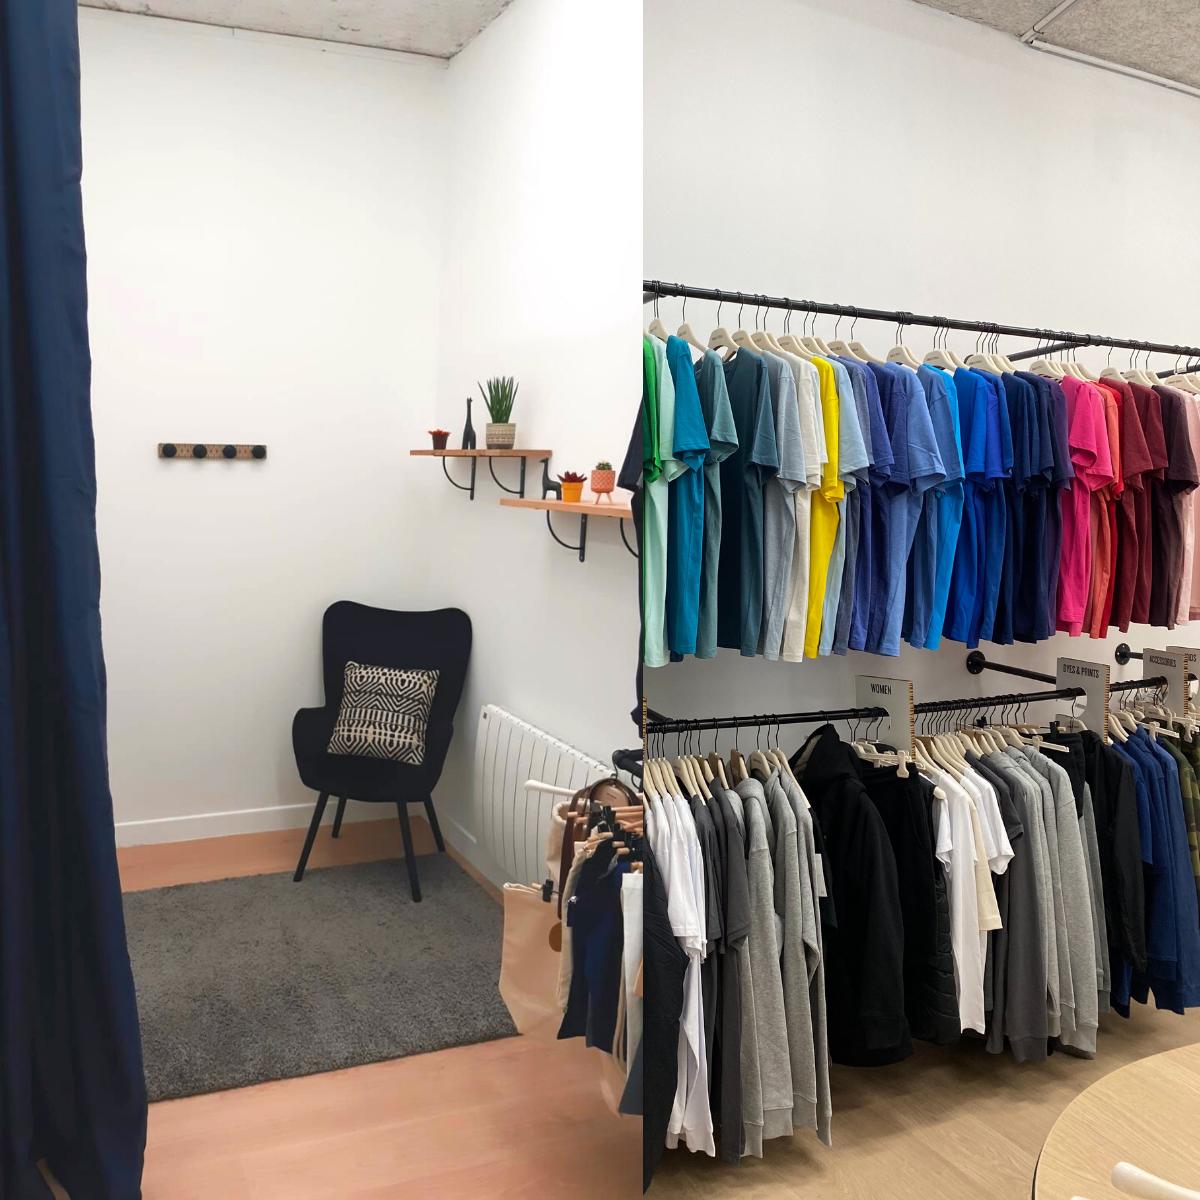 Cabine essayage dans showroom de Tshirt Bio personnalisé